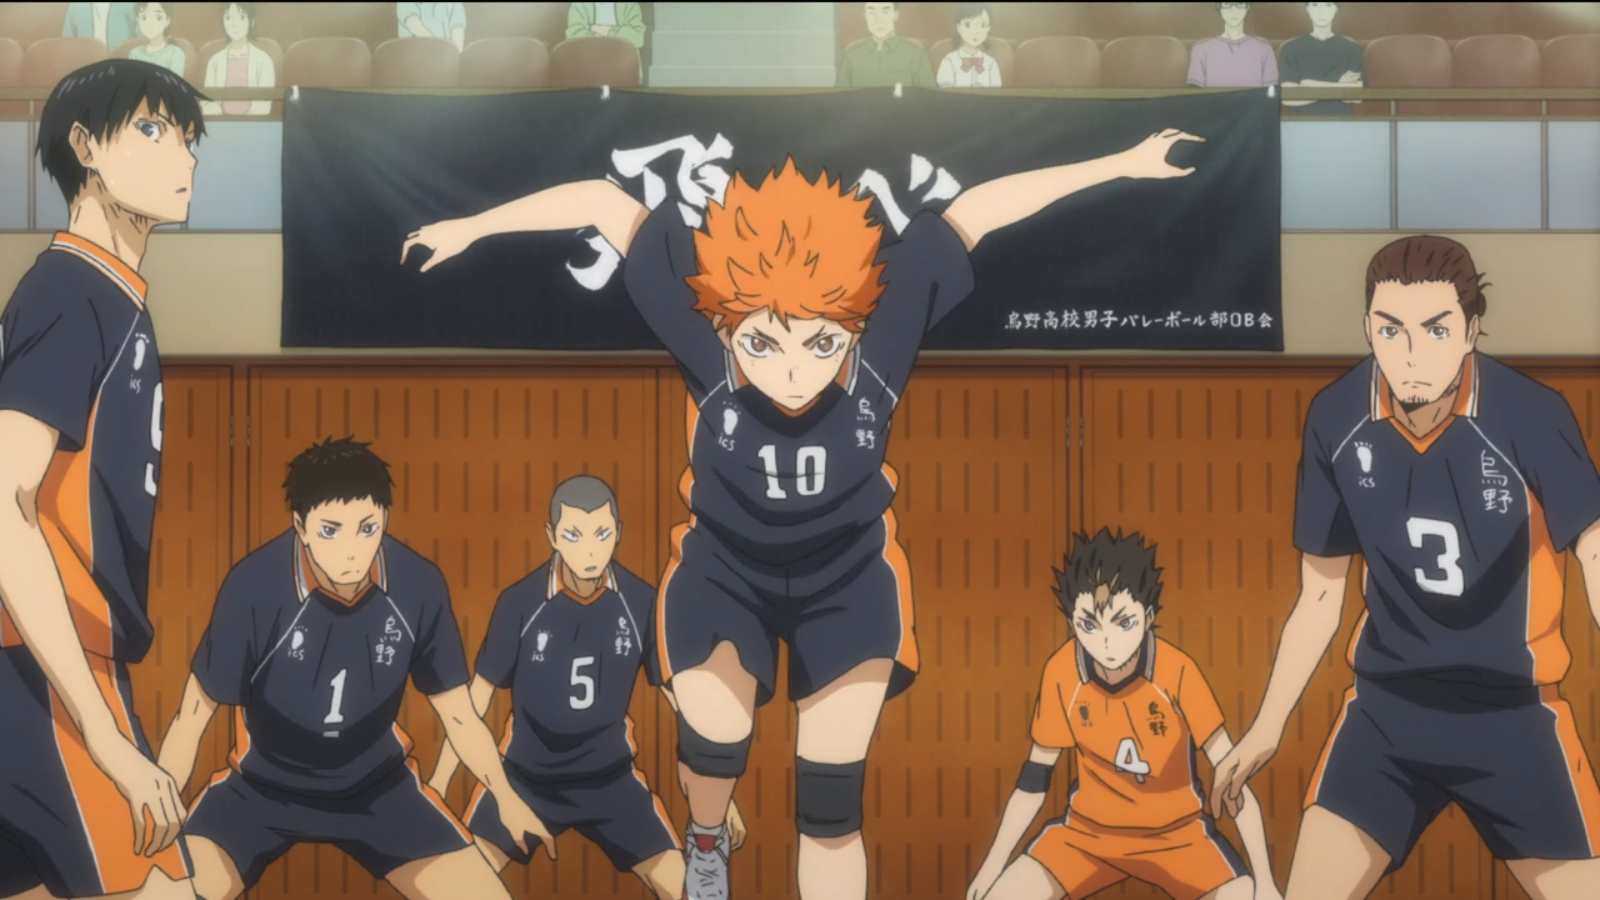 Screenshot Anime Haikyuu Haikyuu Karasuno Haikyuu Haikyuu Wallpaper